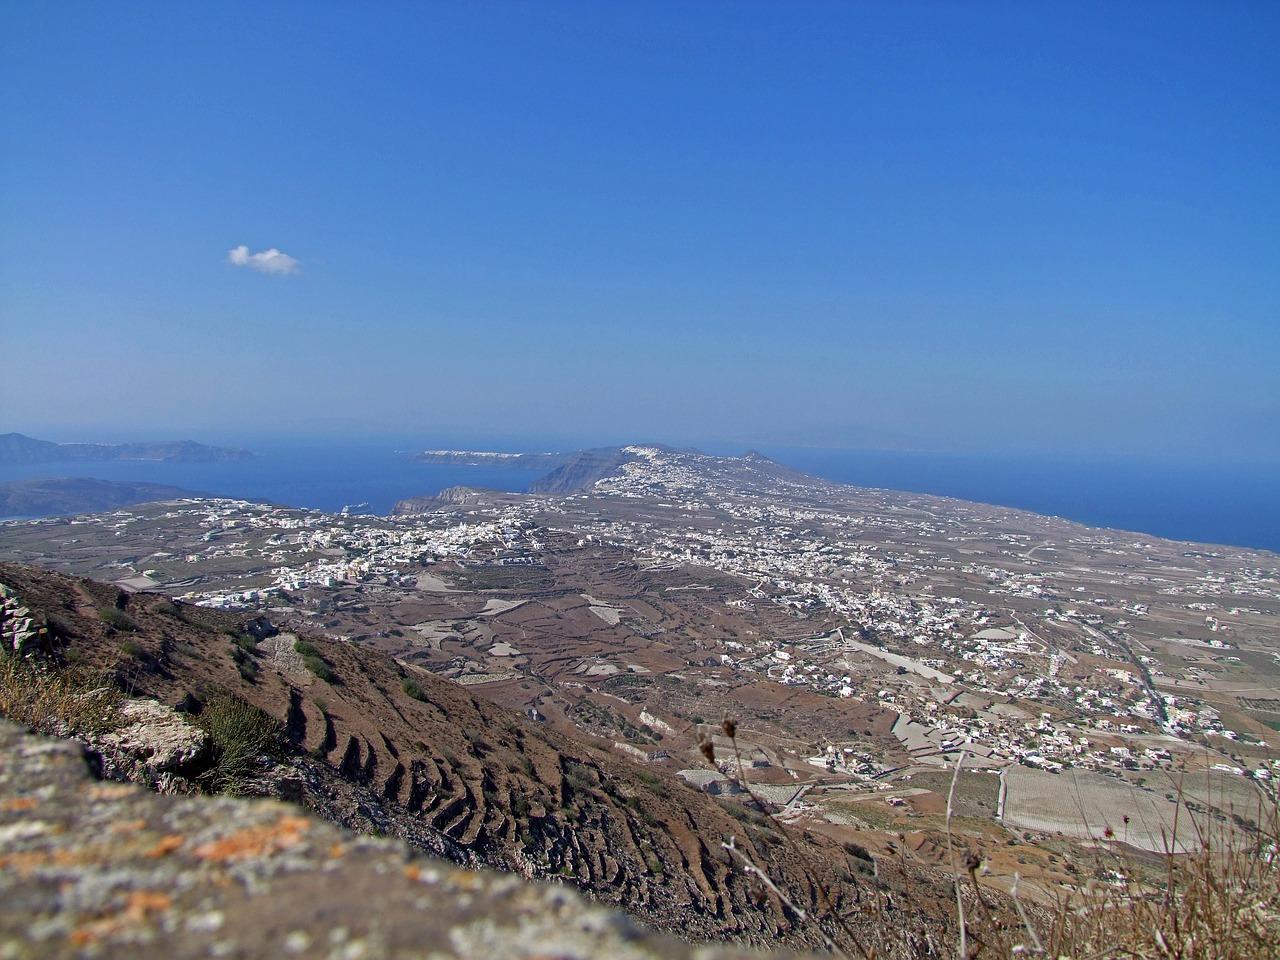 Hogyan lehet eljutni Santorinire